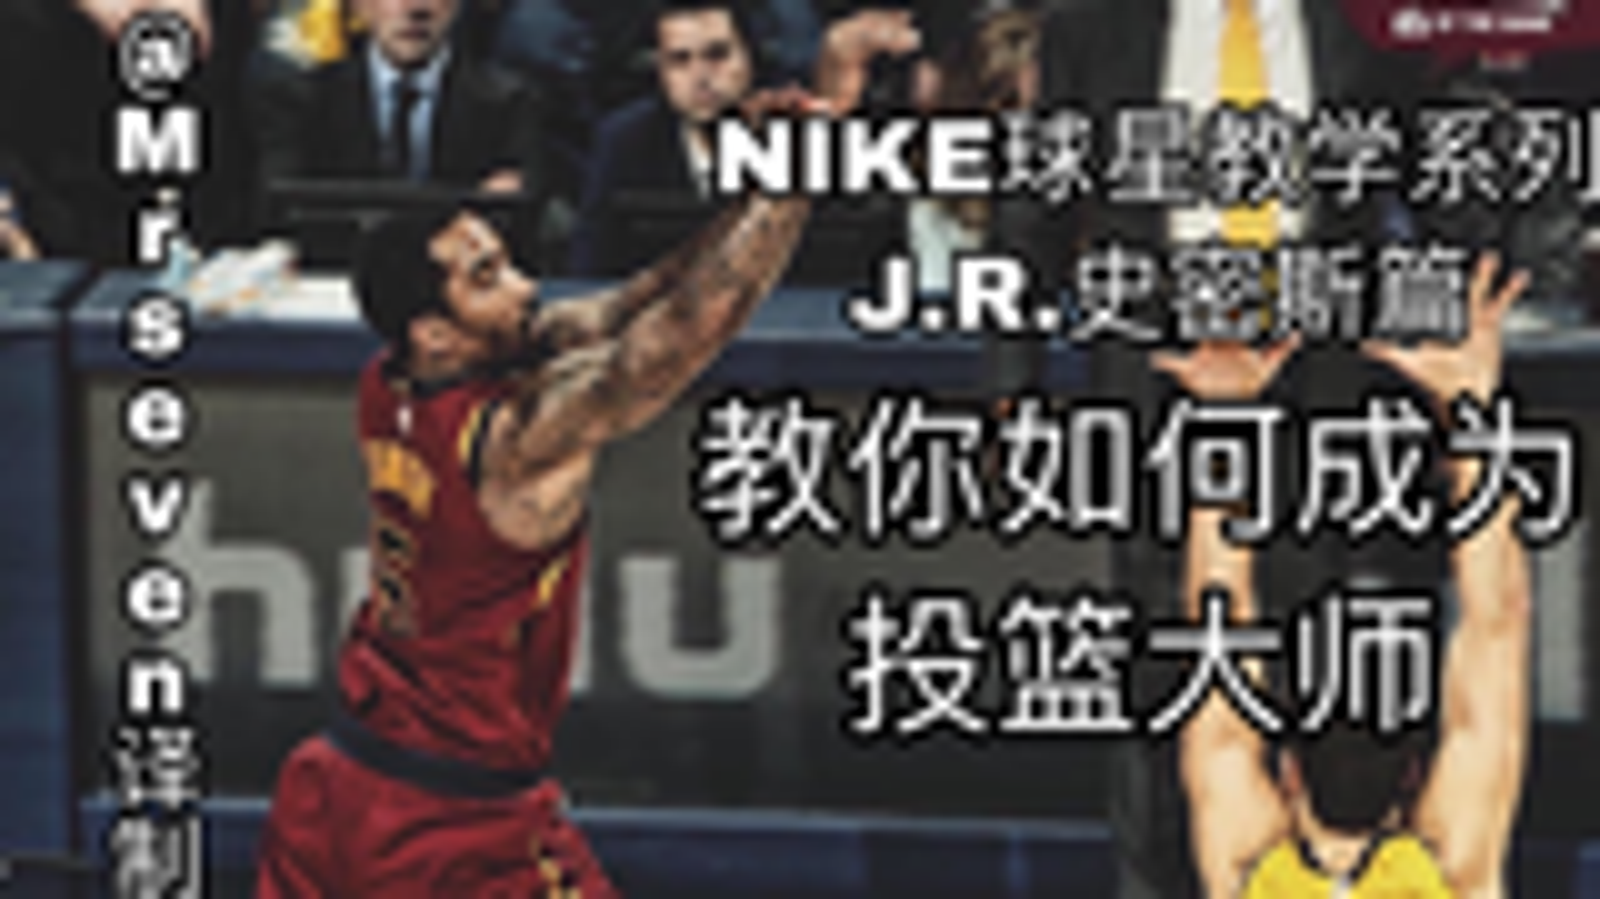 【JR史密斯投篮教学】掩护后投篮教学